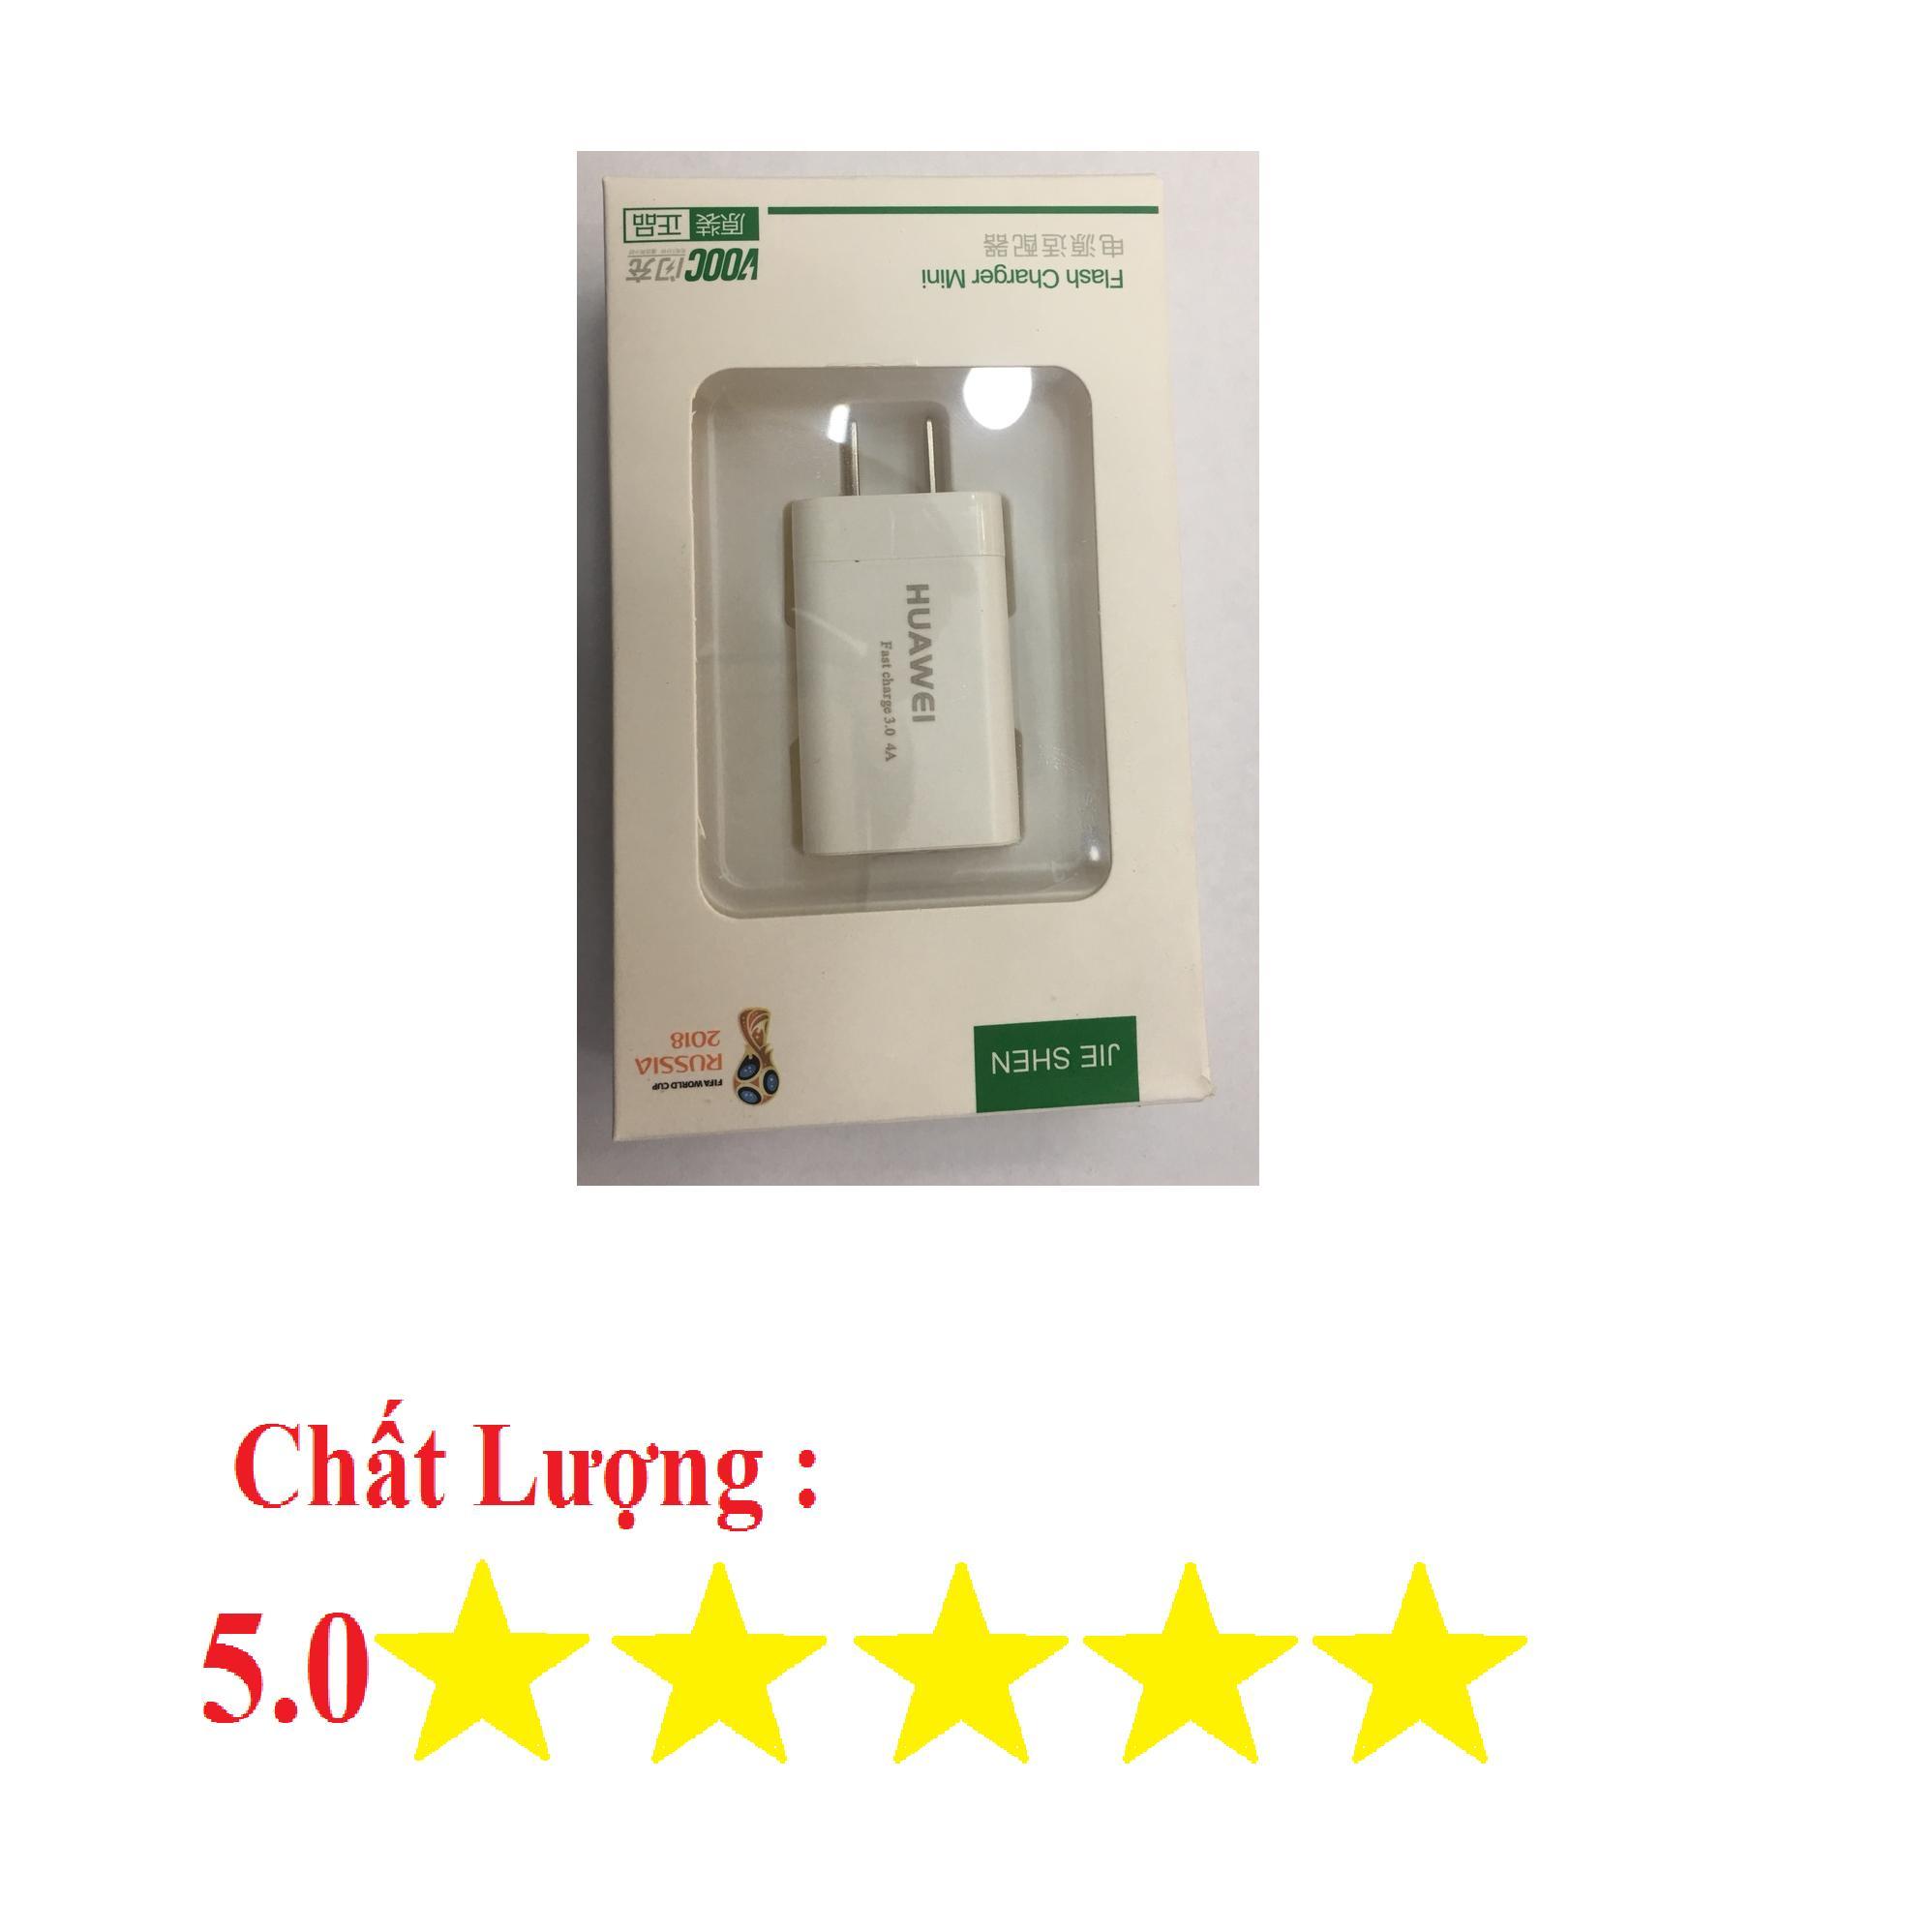 Bộ sạc siêu nhanh cho Huawei Fast Charge 3.0 4A